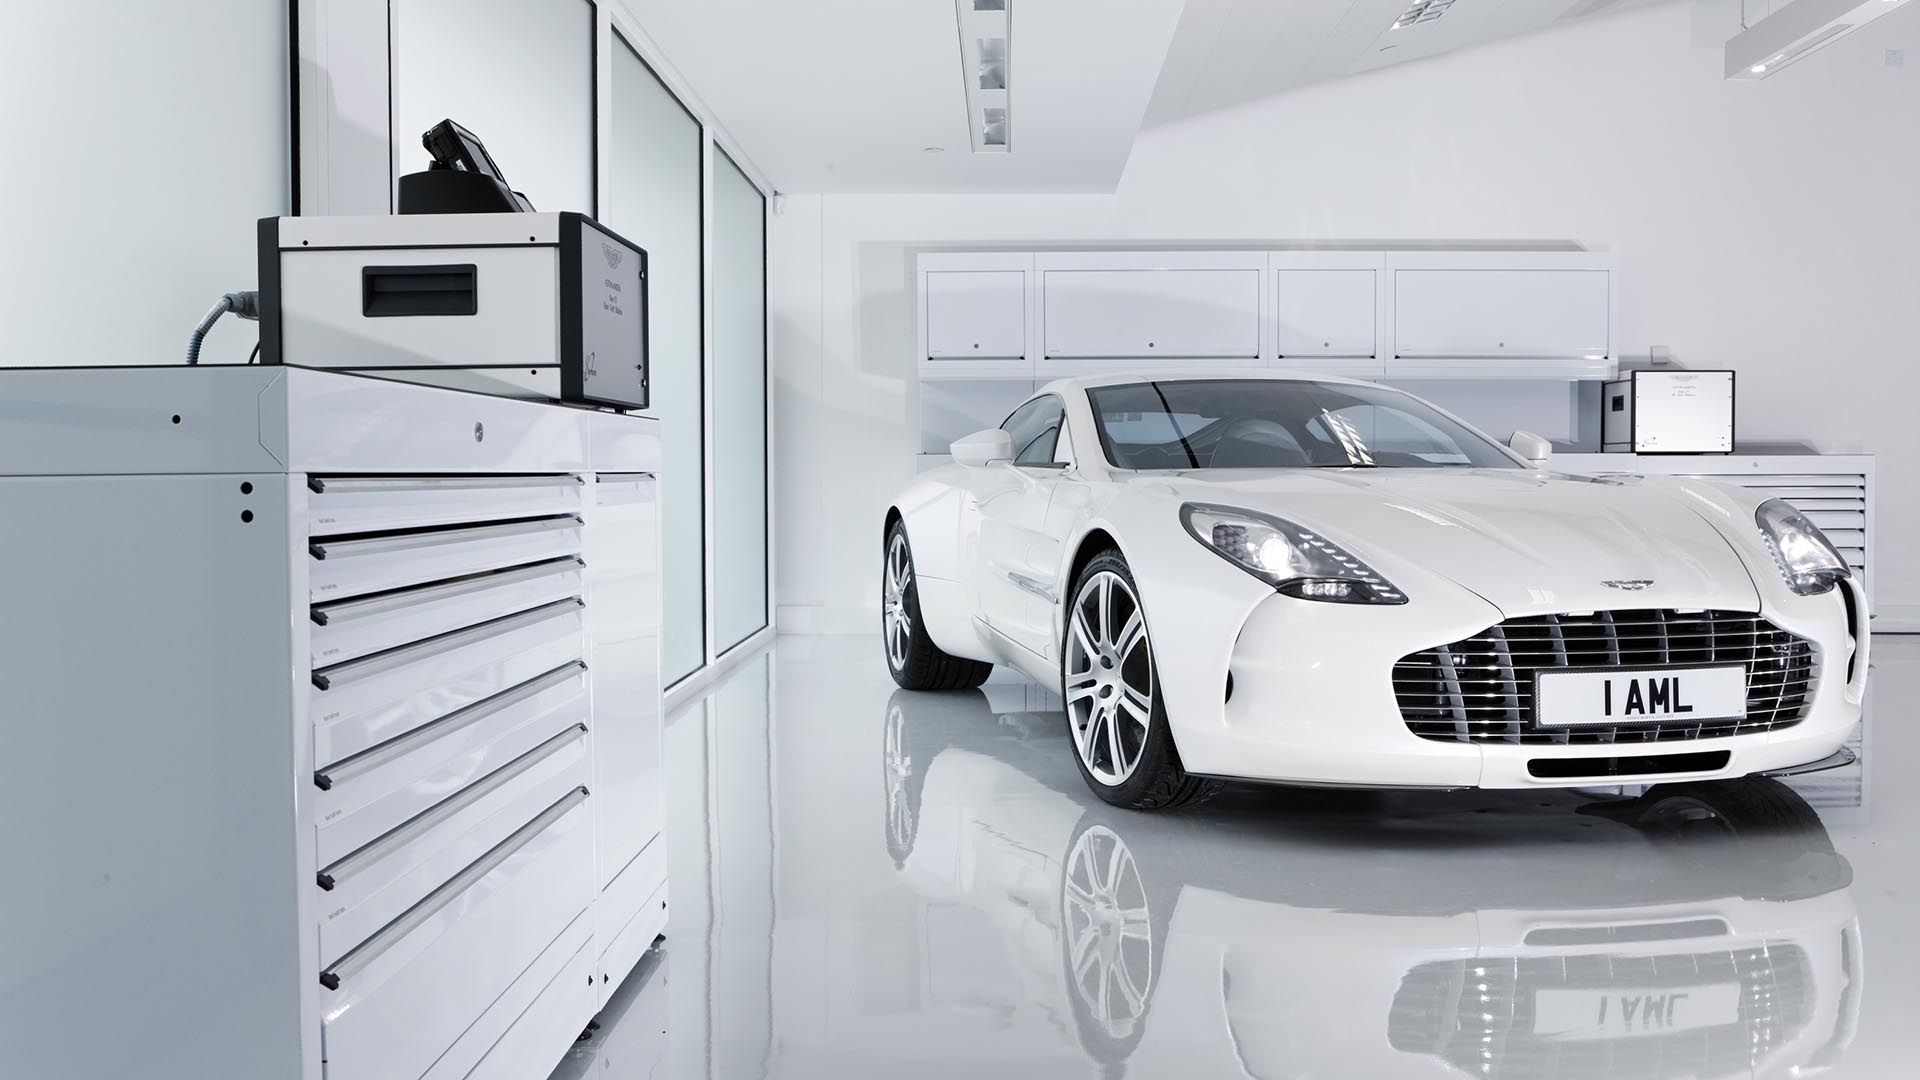 9. Aston